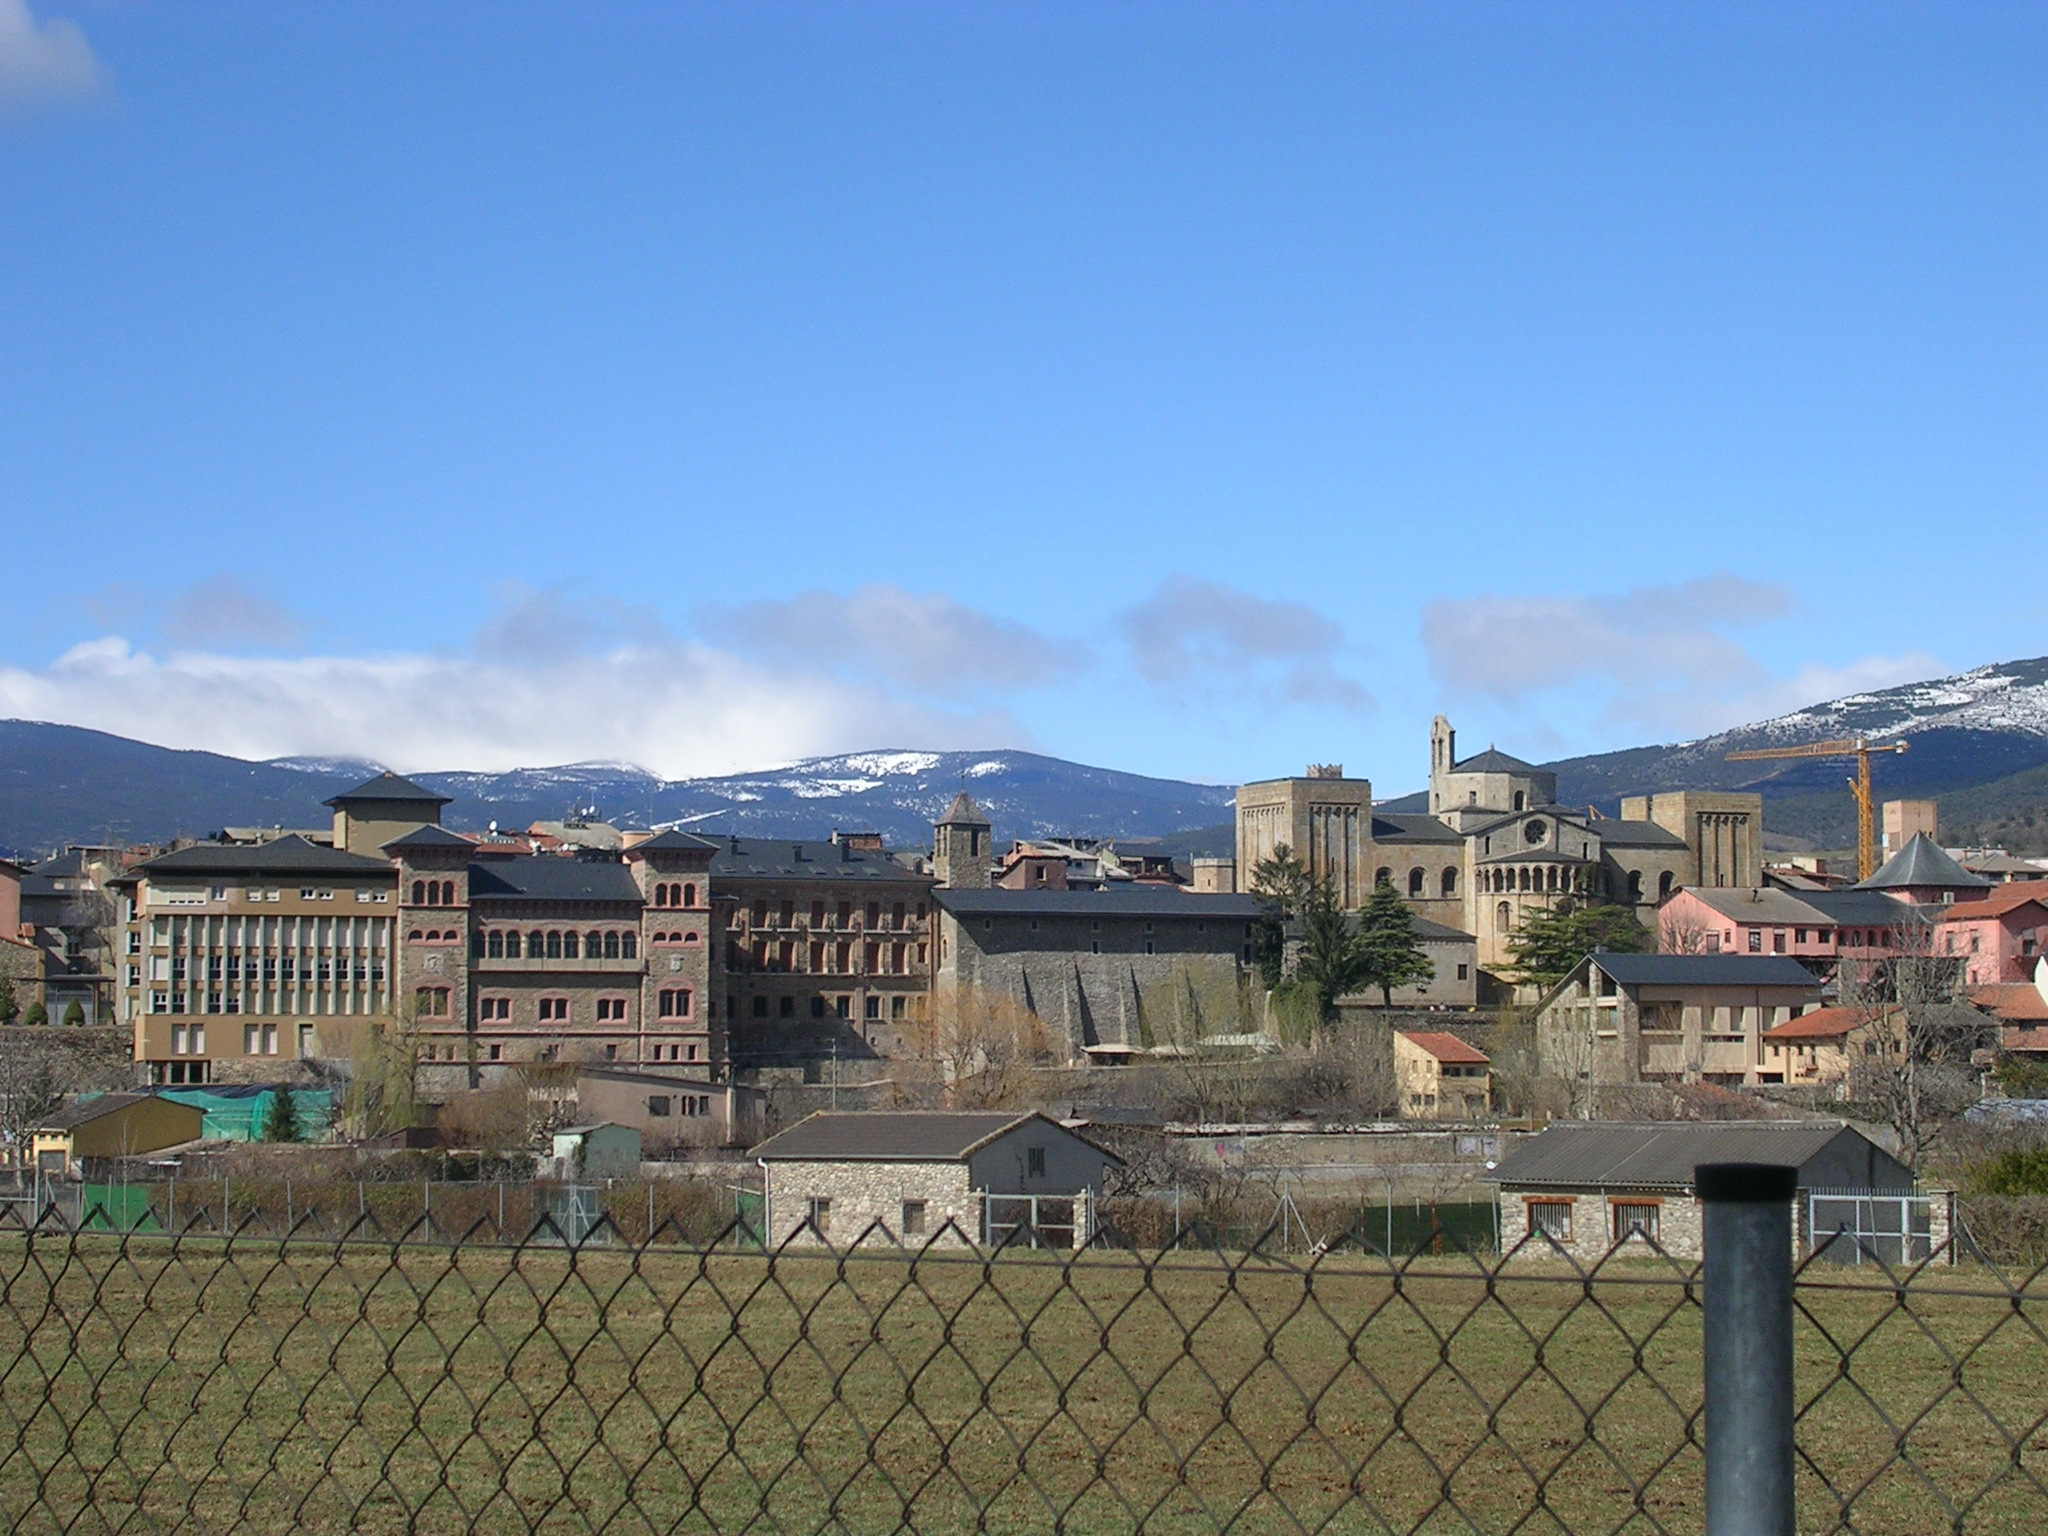 File:La Seu d'Urgell.jpg - Wikimedia Commons